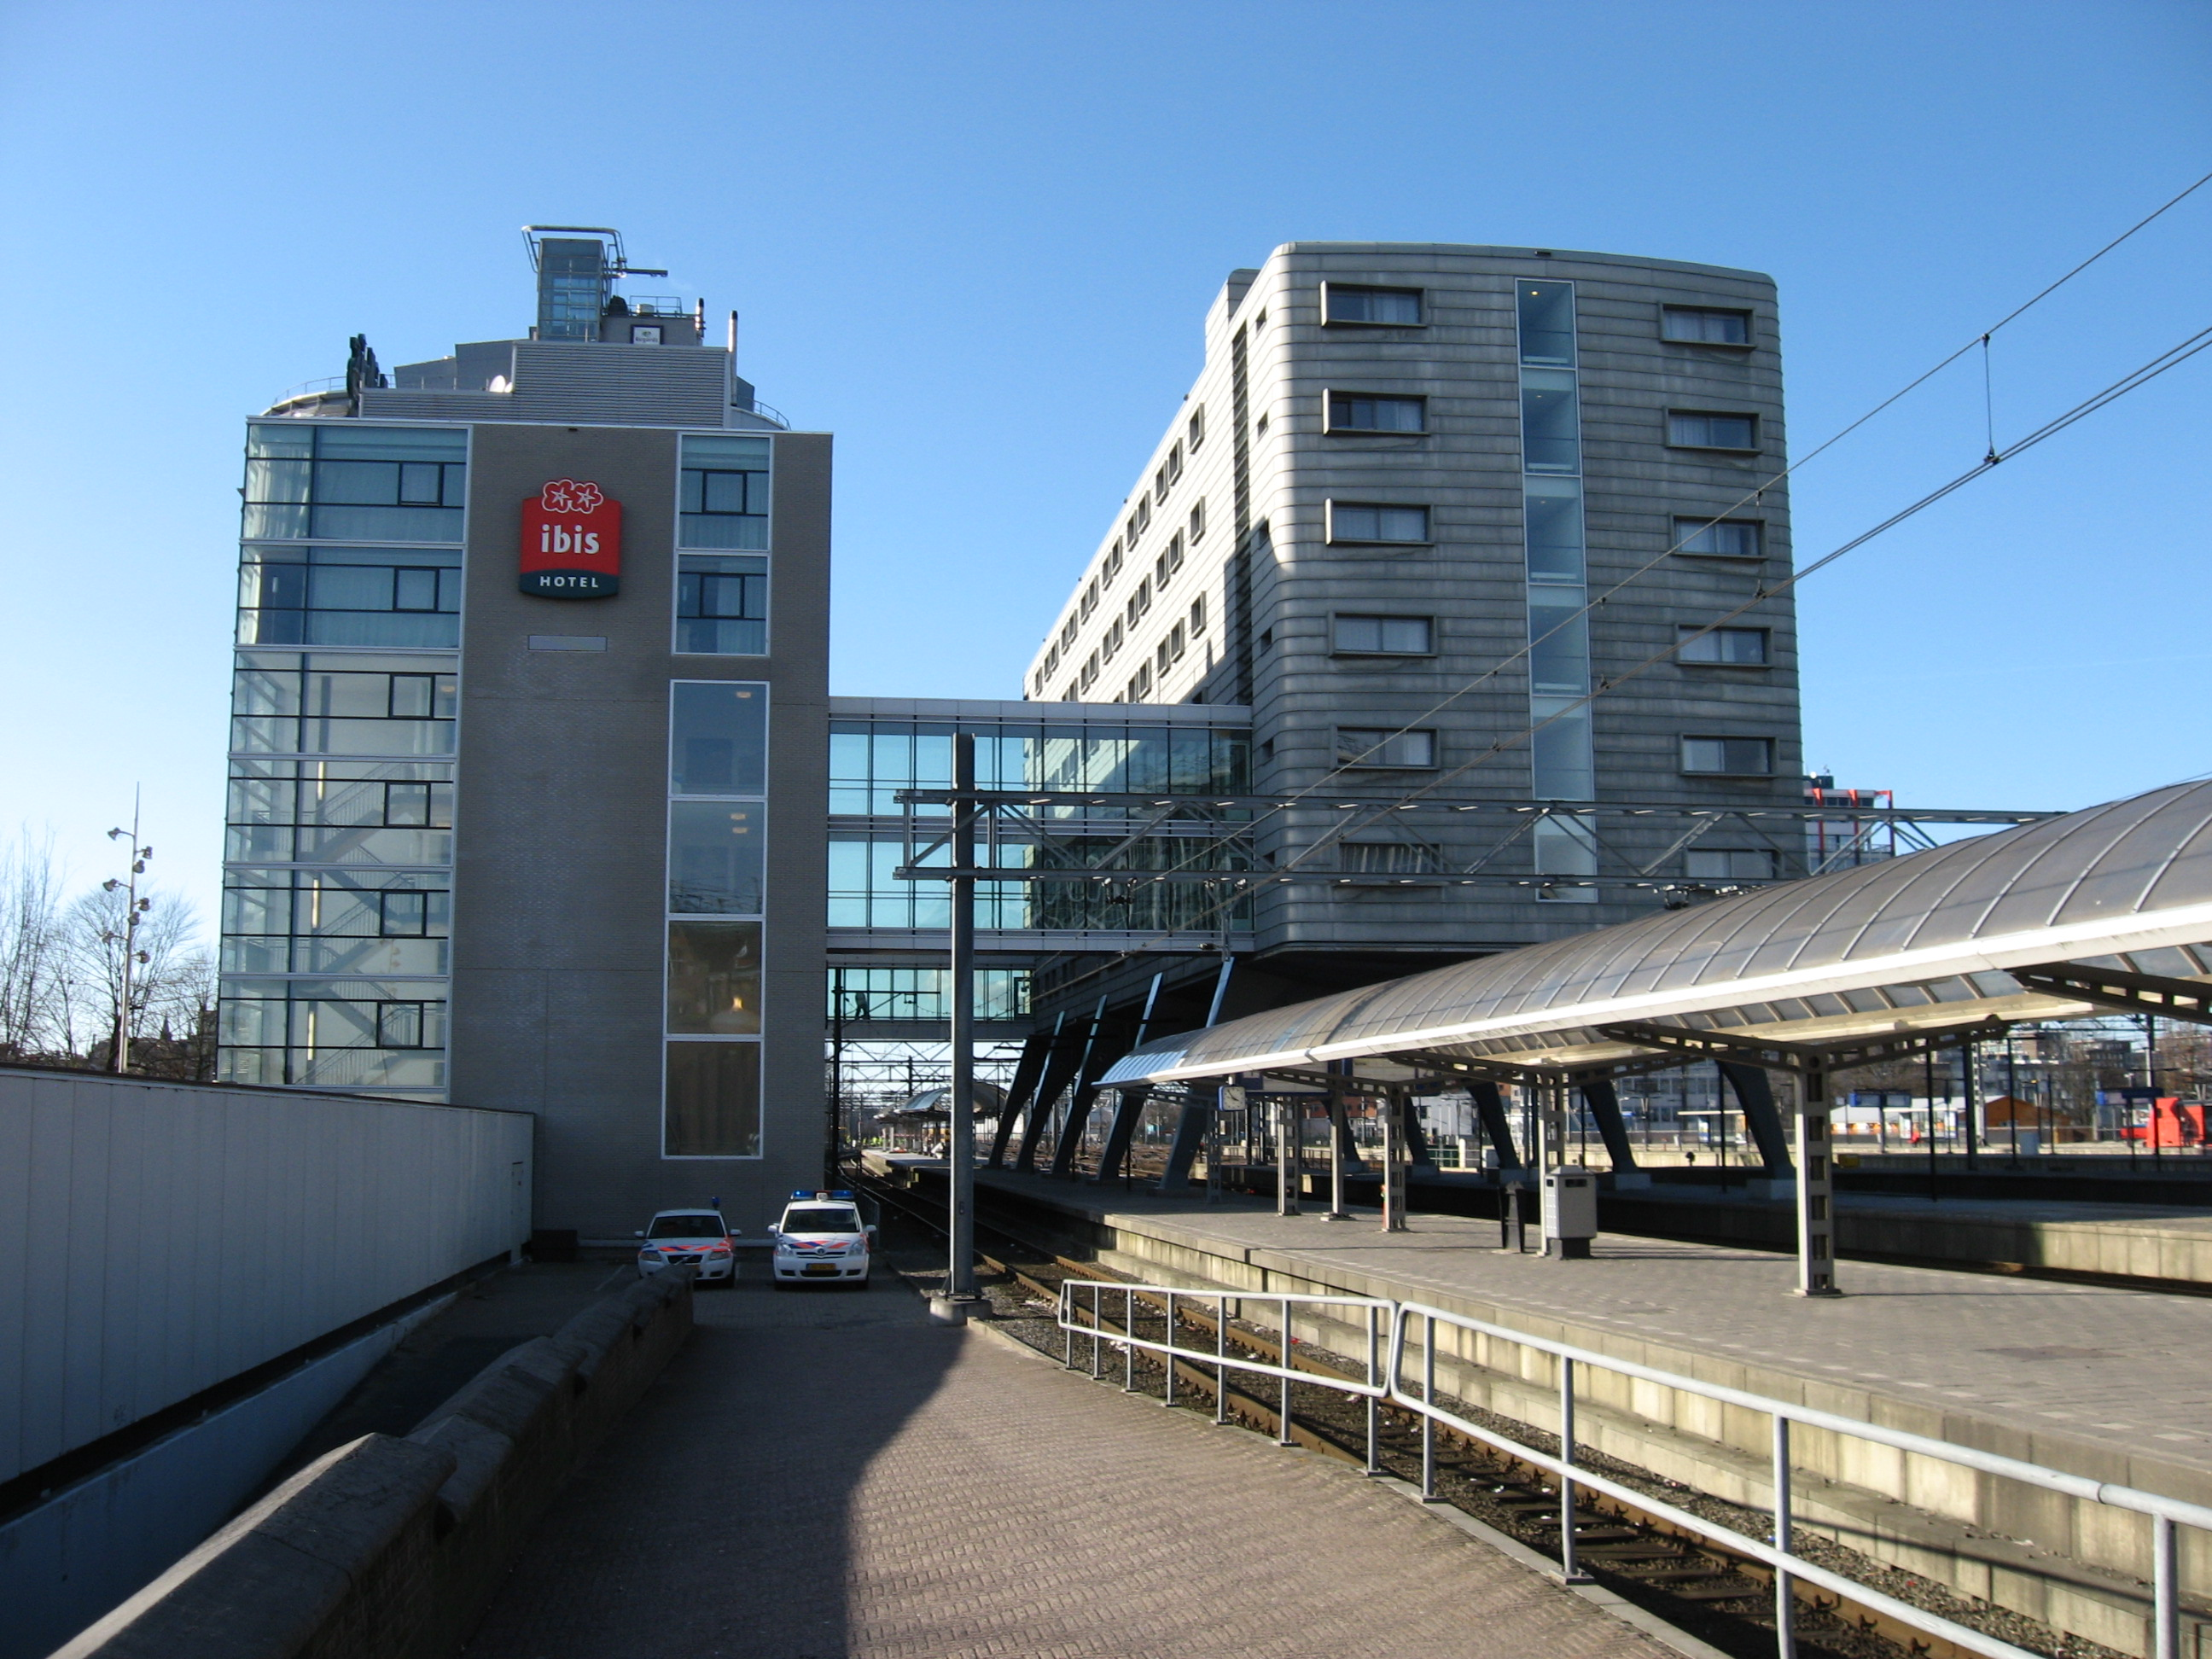 amsterdam hotel ibis america 39 s best lifechangers. Black Bedroom Furniture Sets. Home Design Ideas